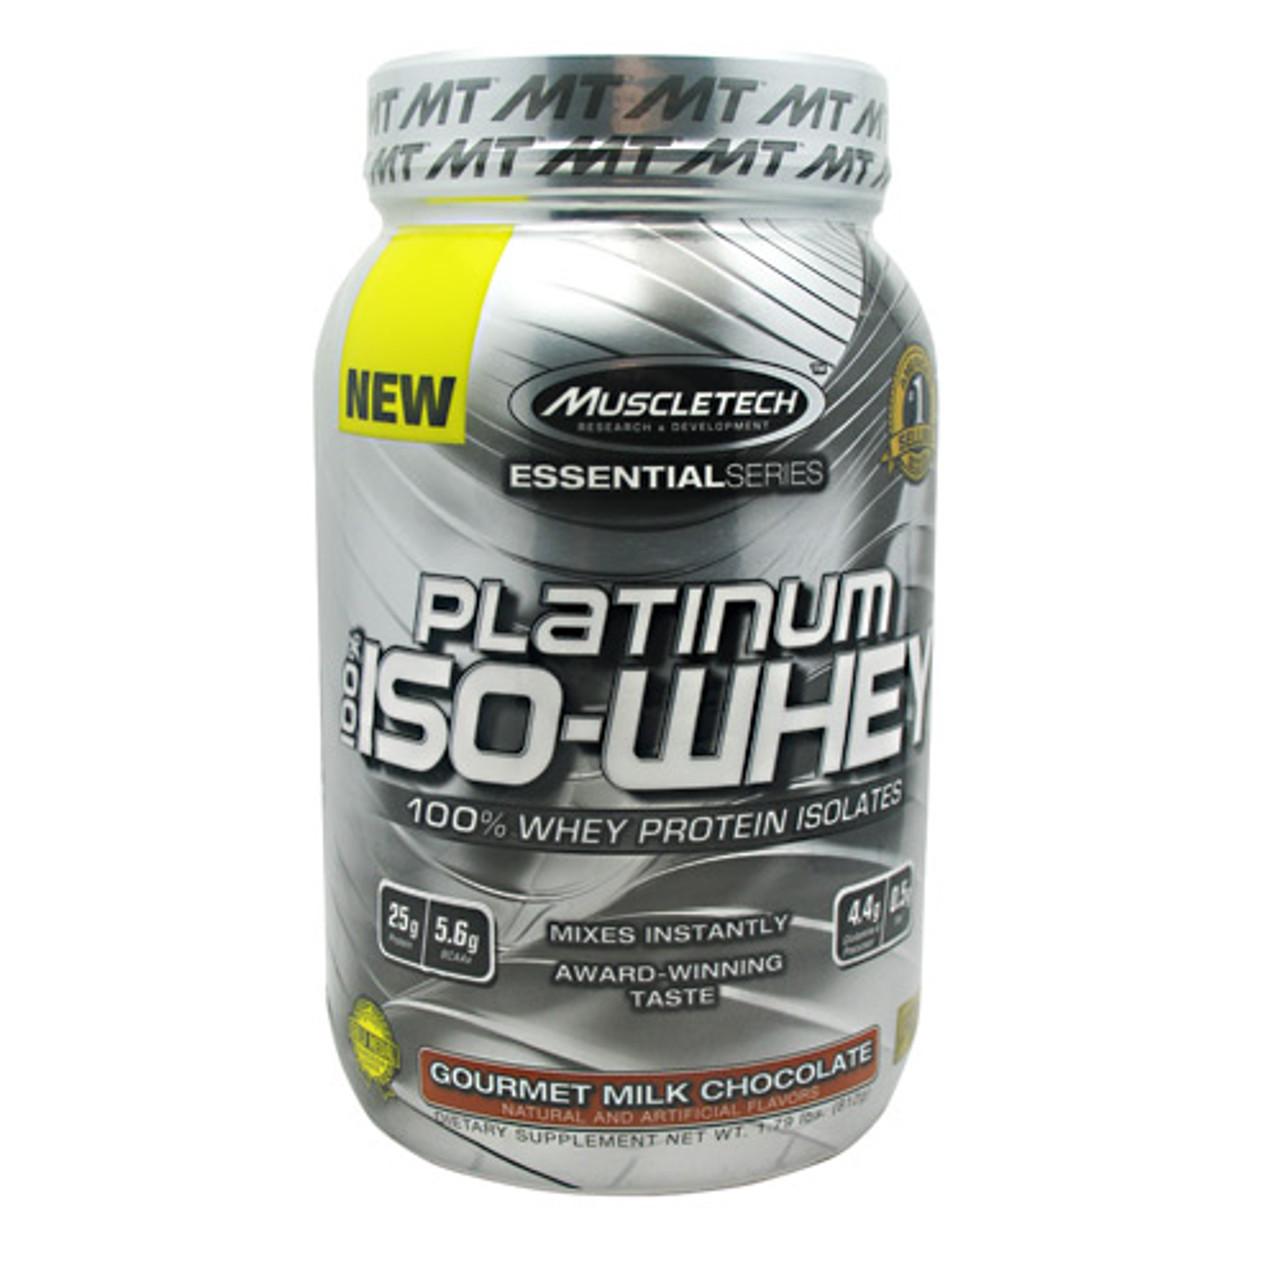 100% Platinum Iso-Whey 1.75lb Muscletech